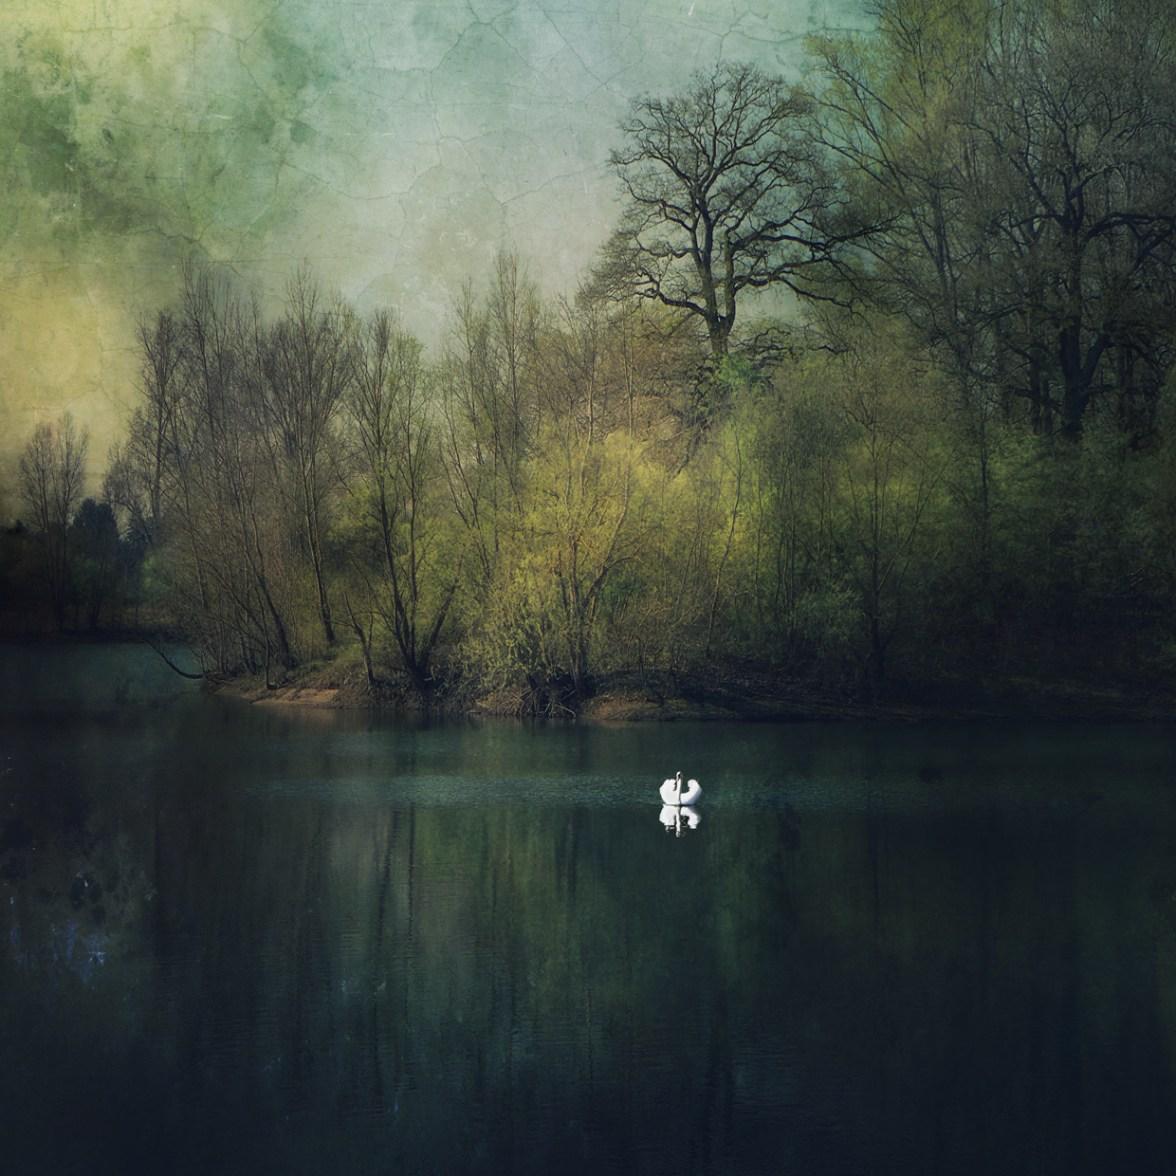 Swan Lake © Bernd Webler